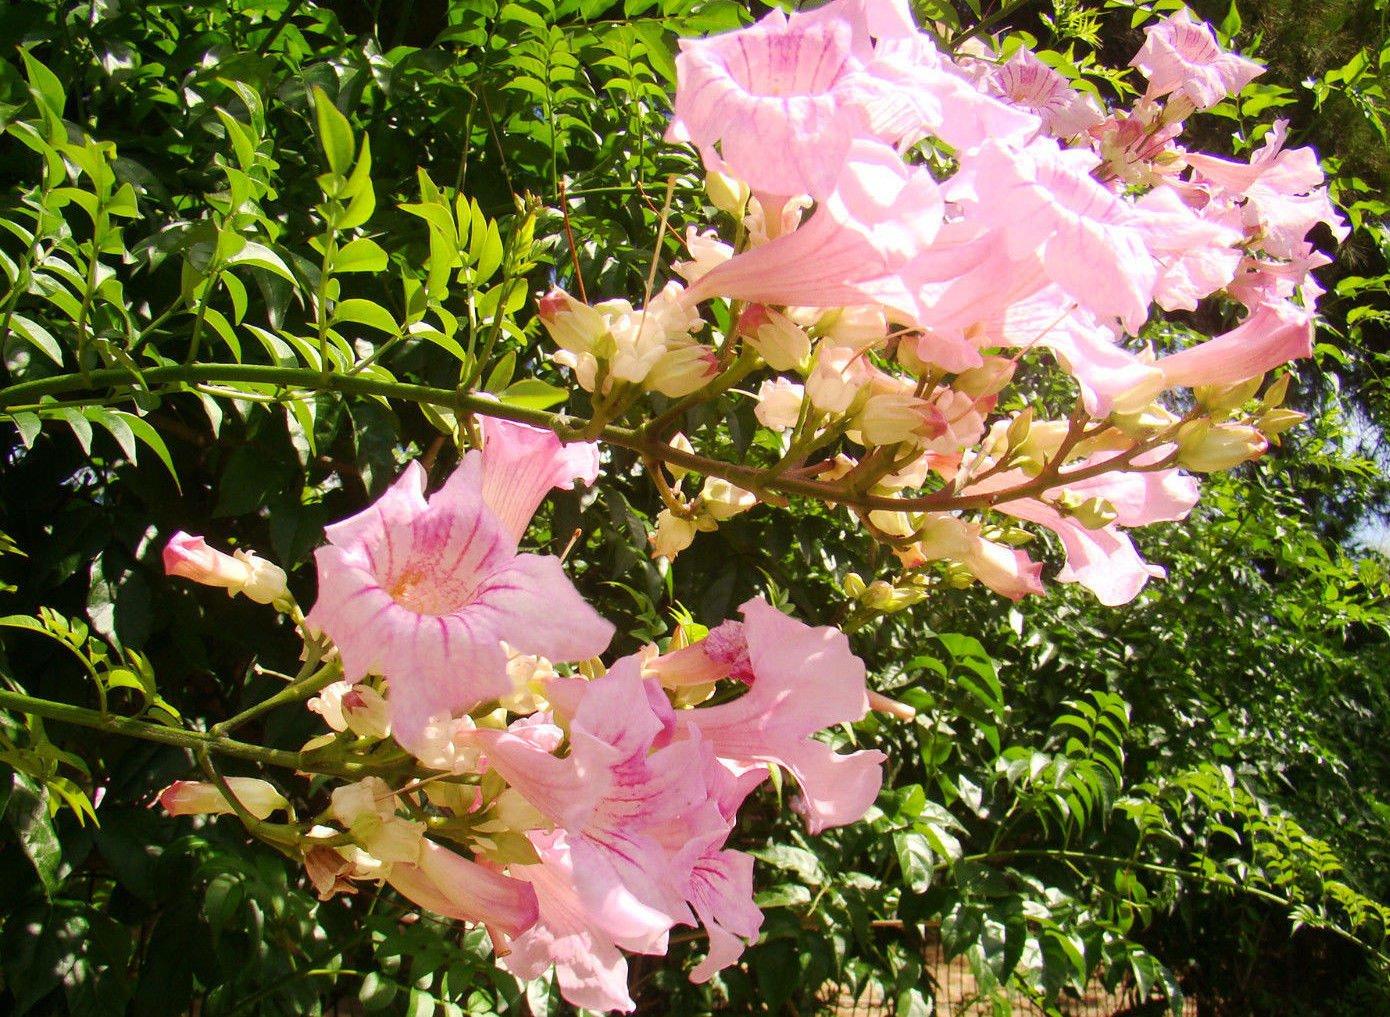 Queen Of Sheba Or Pink Trumpet Vine Podraena Ricasoliana Flowering